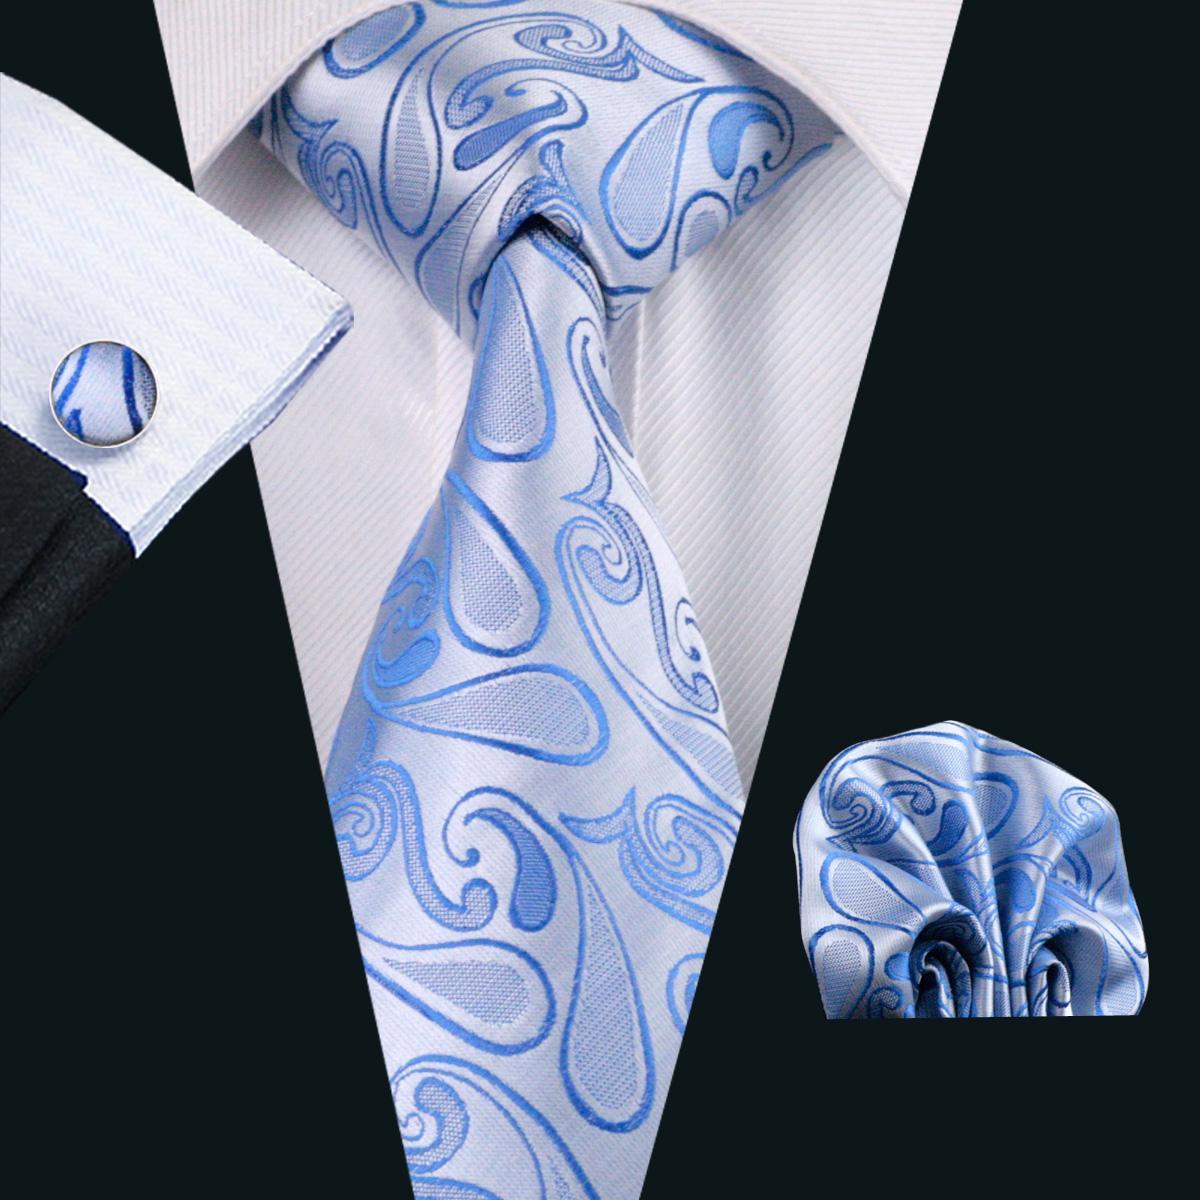 Paisely Tie Pocket Square Manchetknopen Set Blauw Kleur 8.5cm Breedte Meeting Business Casual Party Stropdas Jacquard Woven N-1157